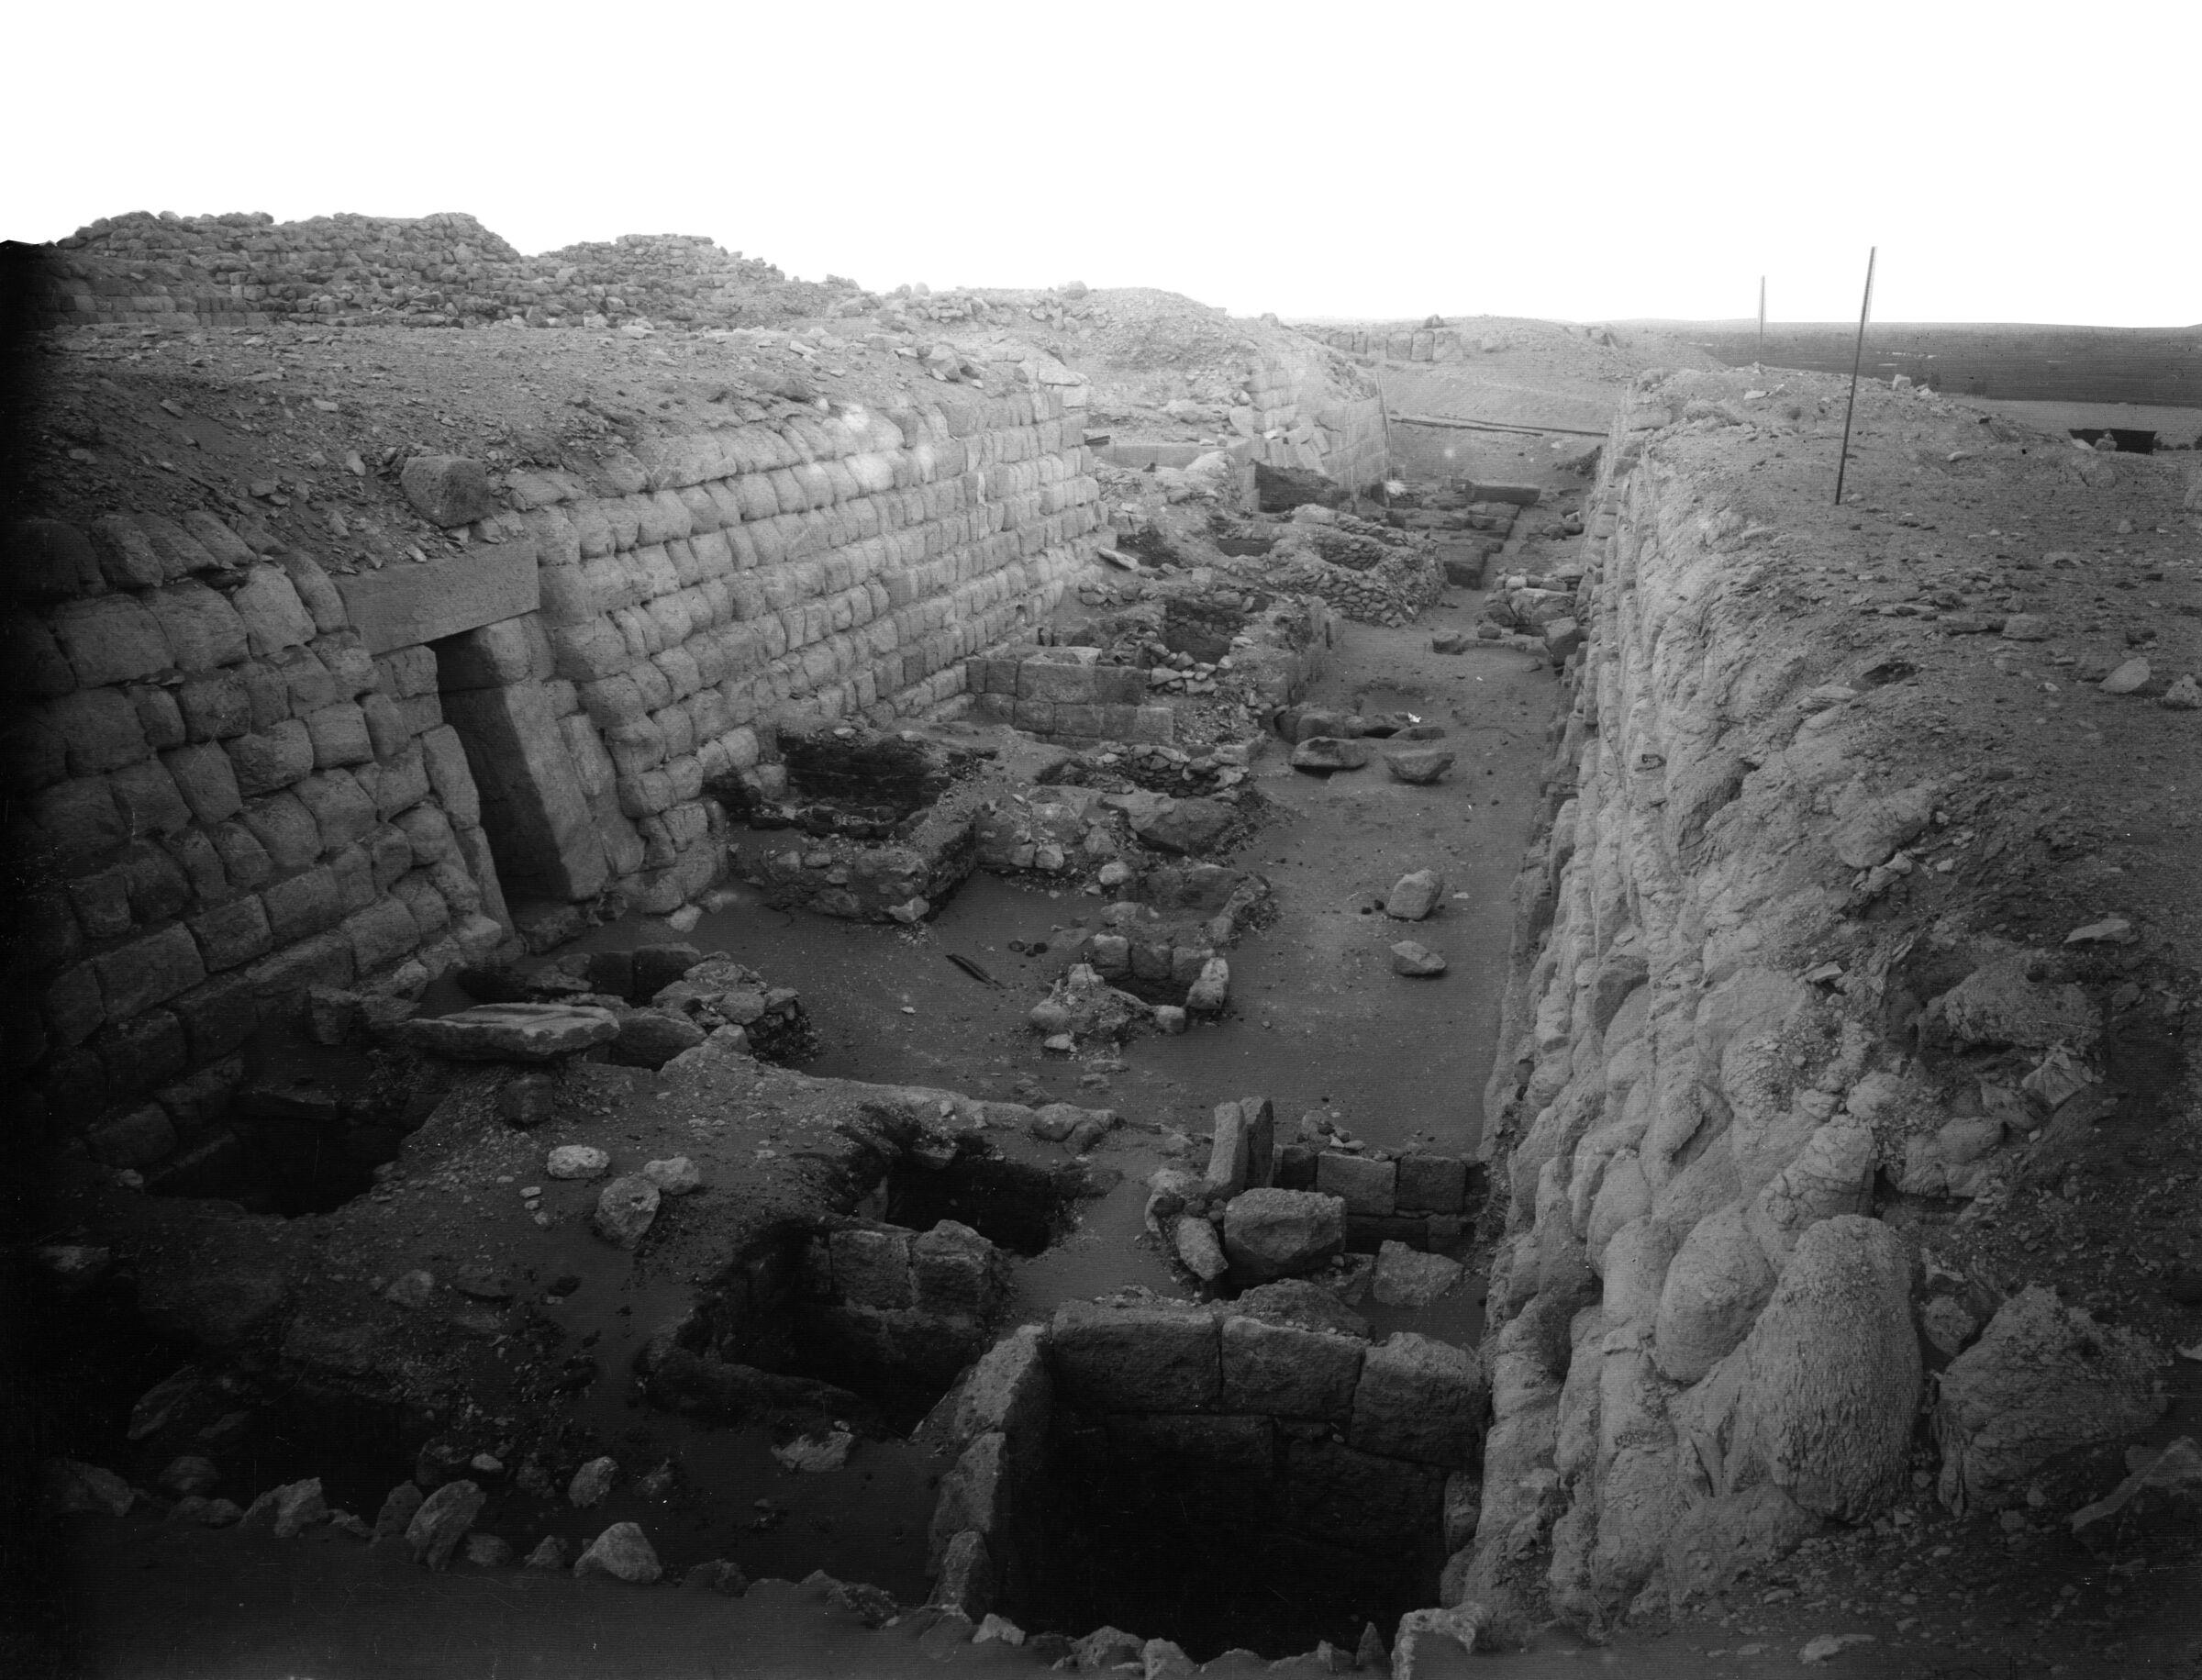 Western Cemetery: Site: Giza; View: G 2140, G 2160, G 2148, G 2147, G 2146, G 2145